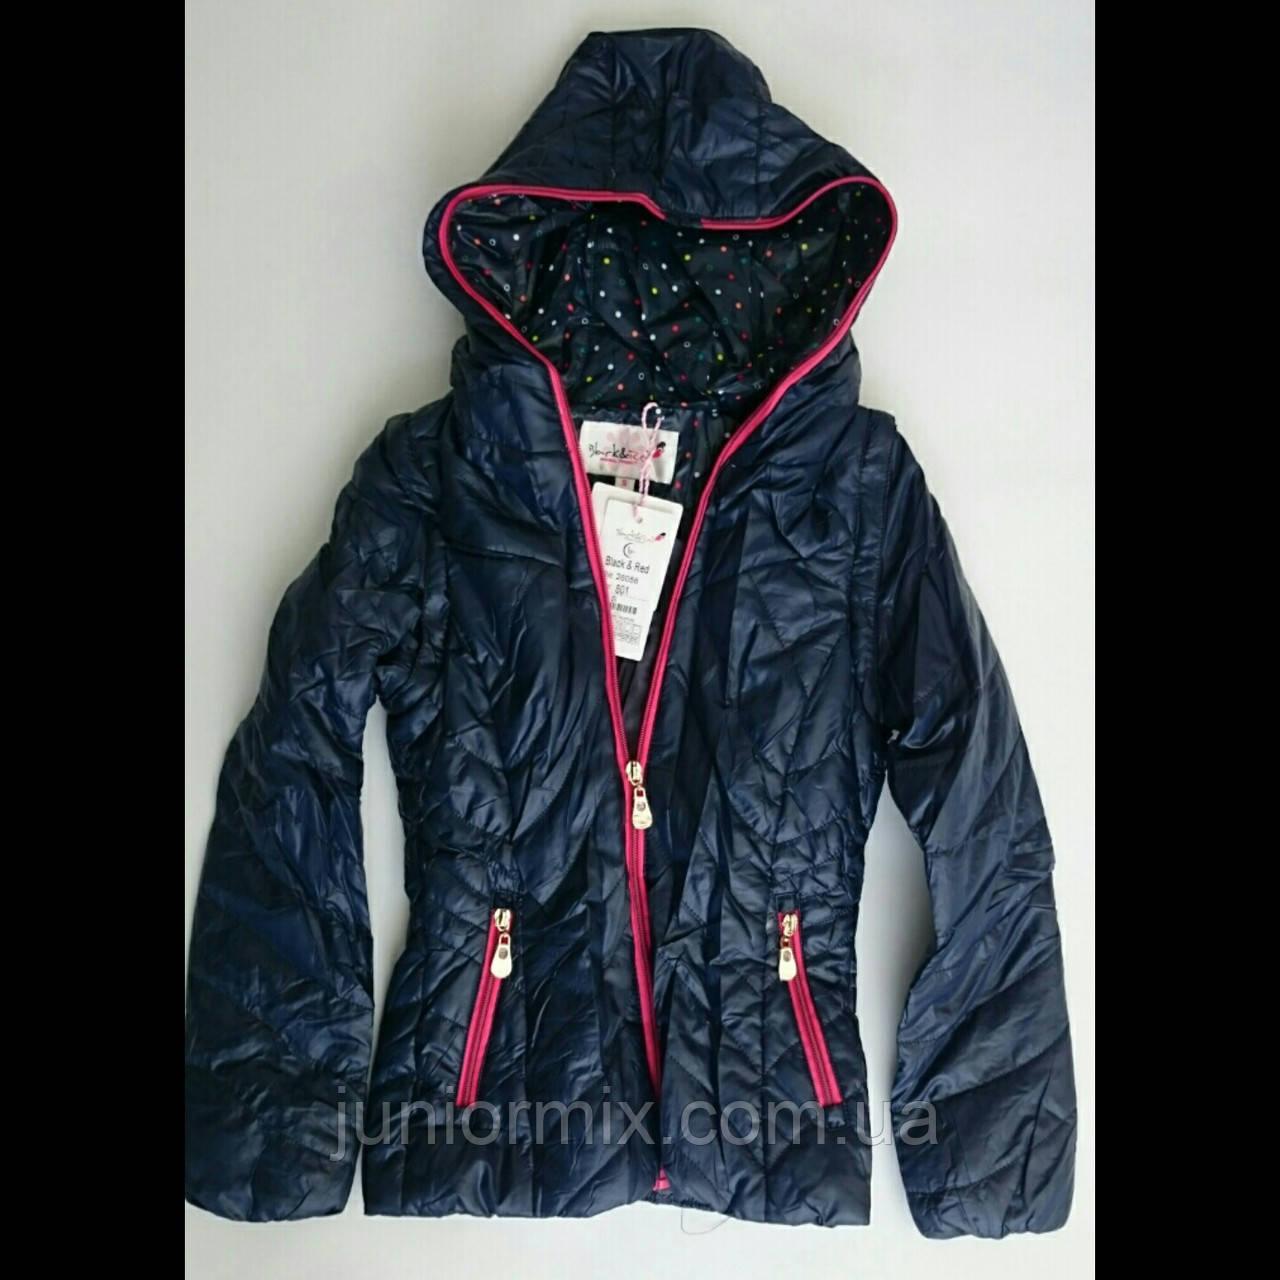 Куртка подростковая весенняя на девочку  Back&Red